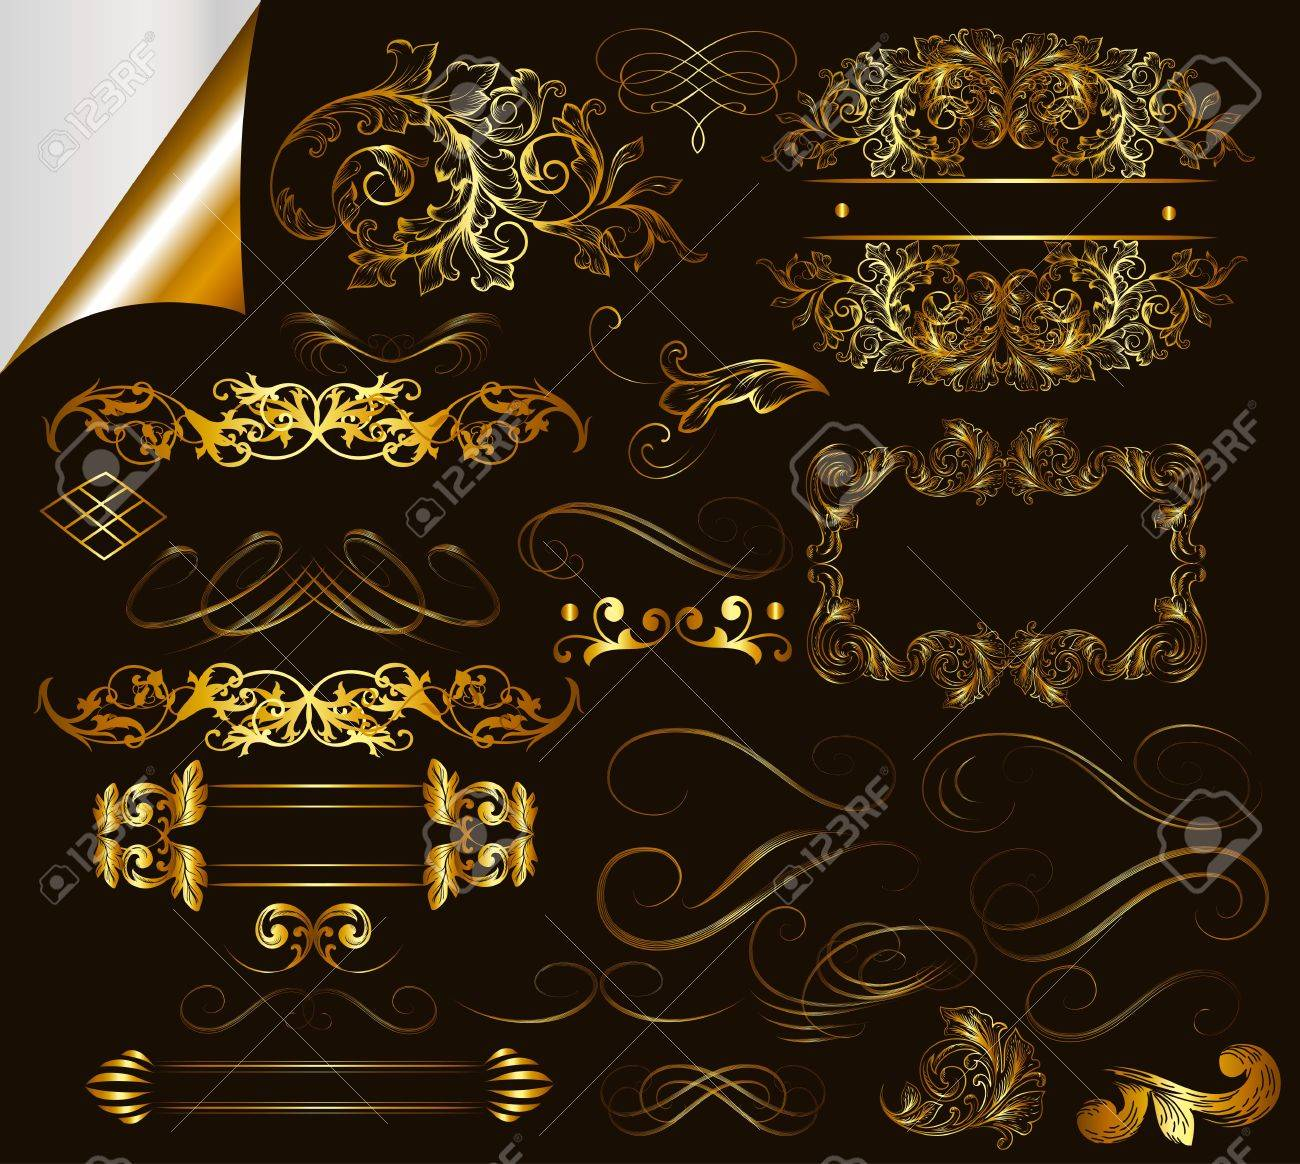 Calligraphic ornate decorative elements  Calligraphic Stock Vector - 17474989